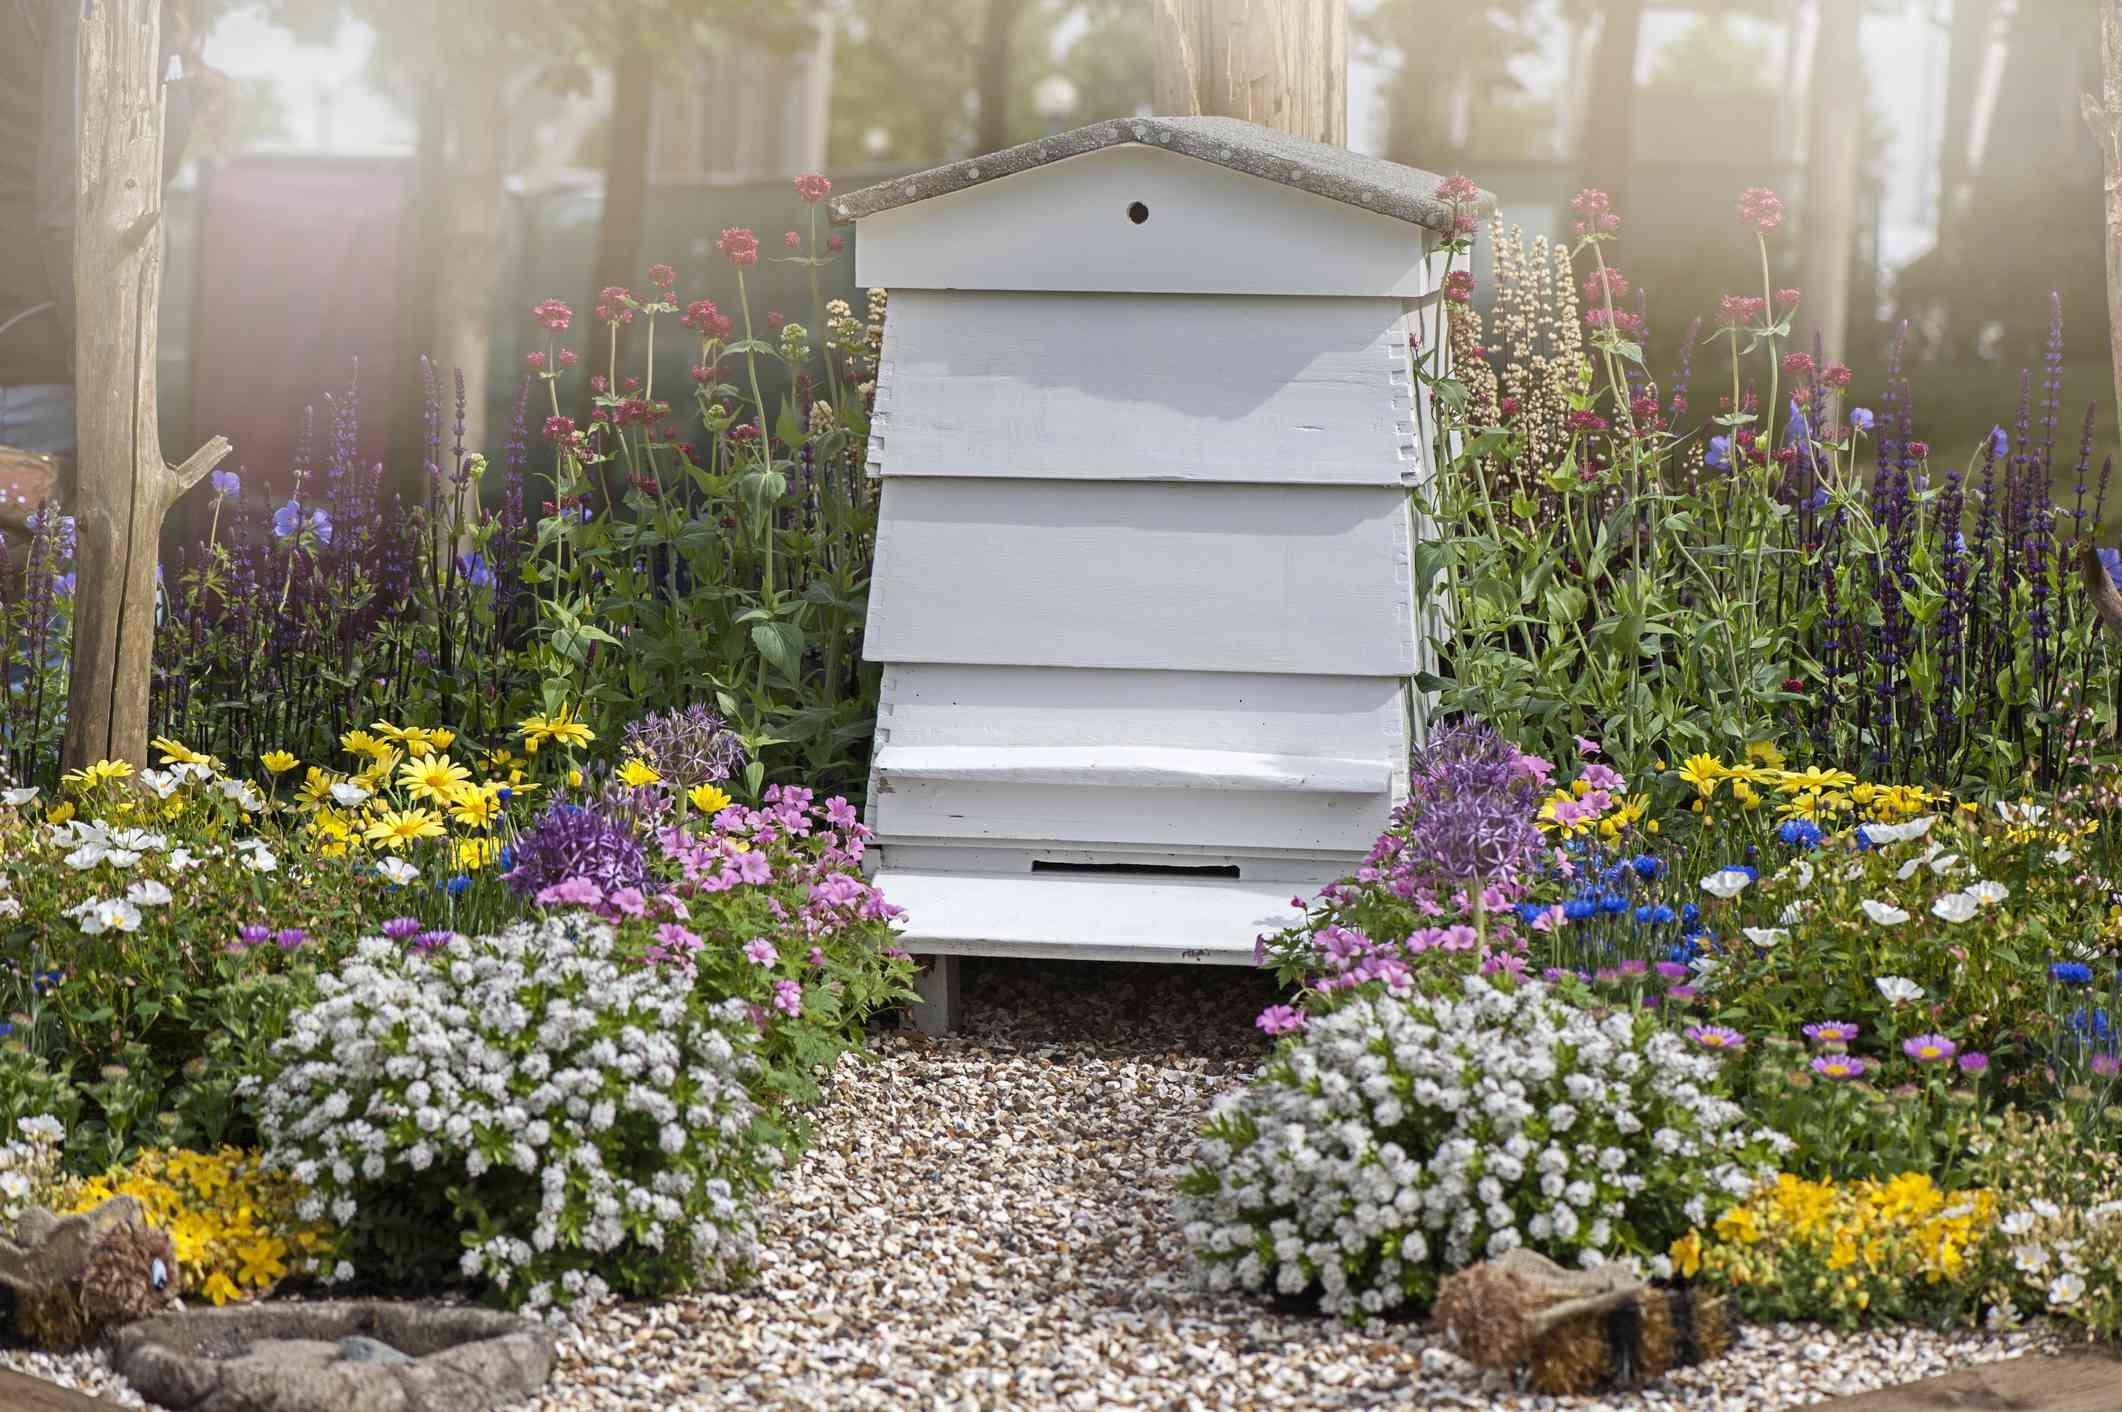 beehive in a garden